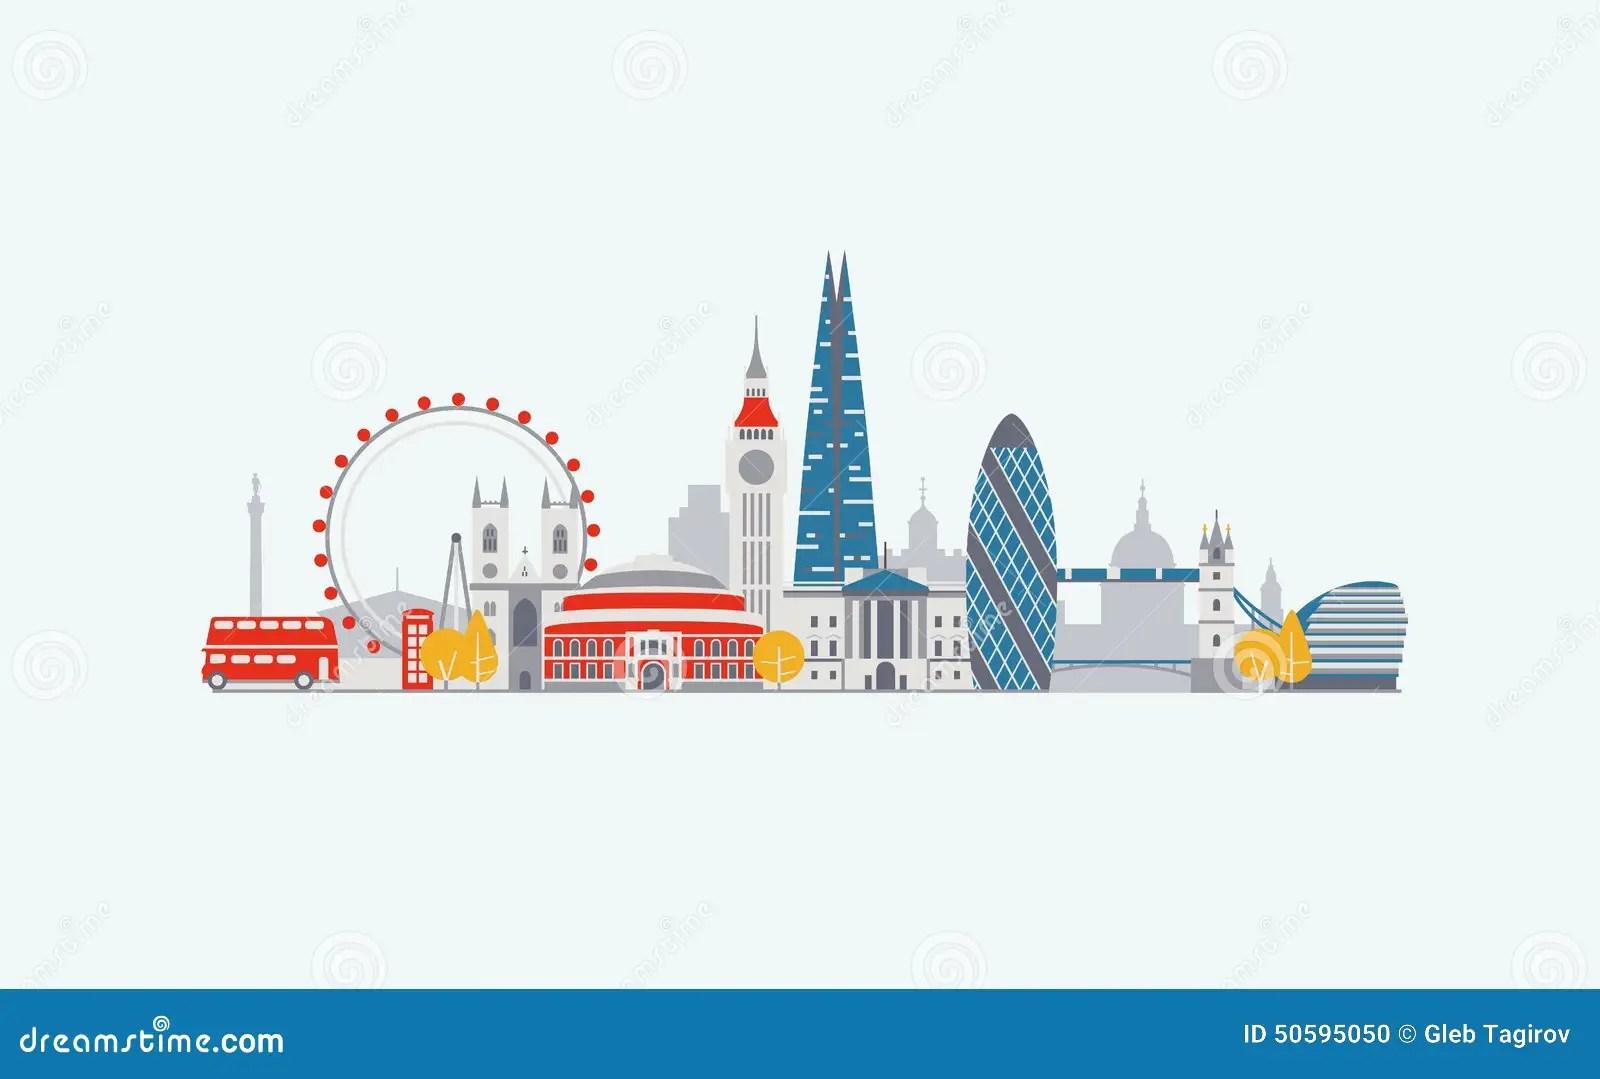 Cartoon Animation Wallpaper Free Download London Skyline Stock Vector Image 50595050